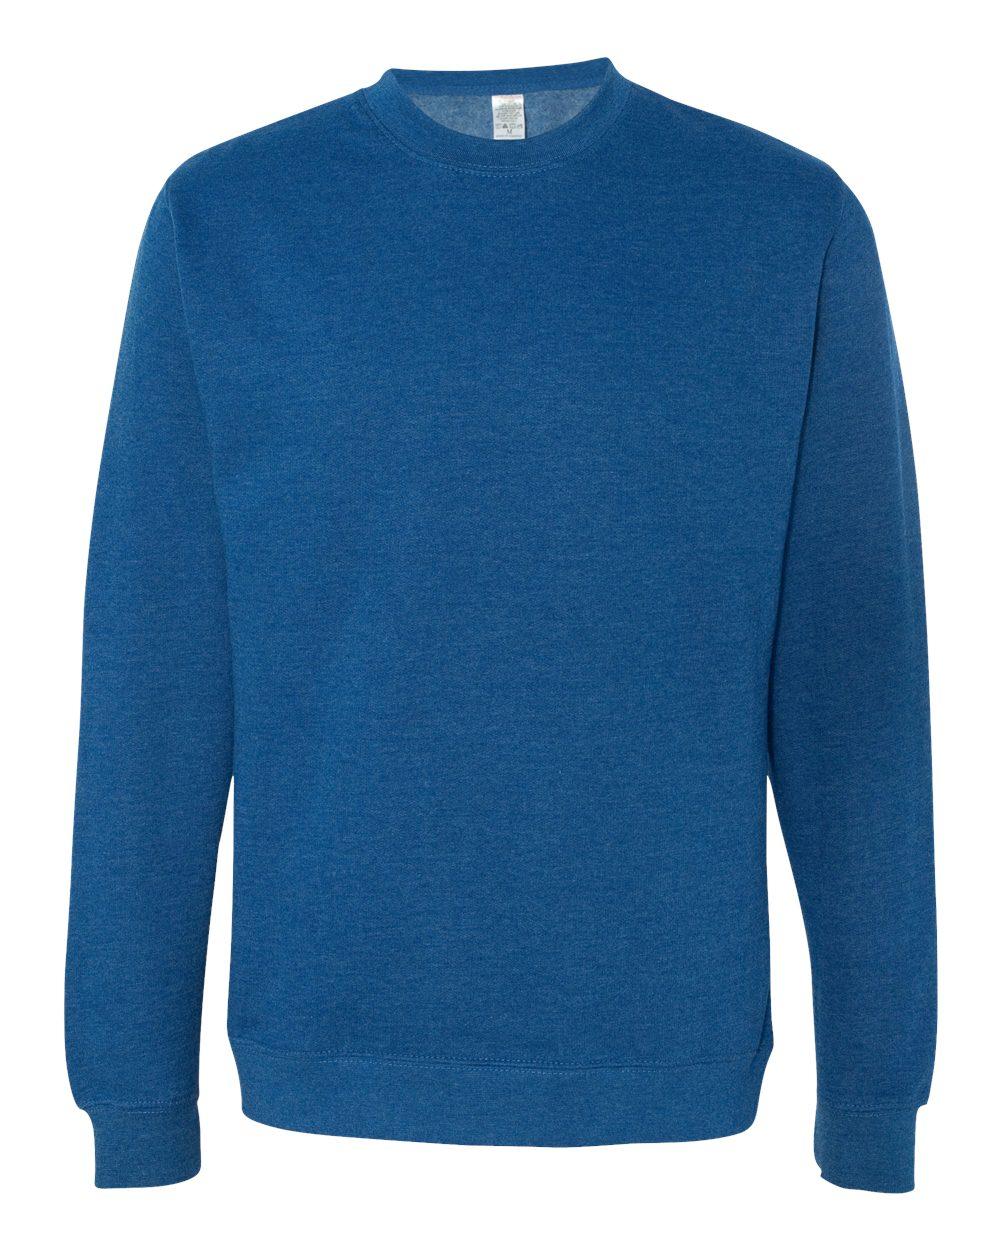 Picture of Independent Adult Midweight Crewneck Sweatshirt